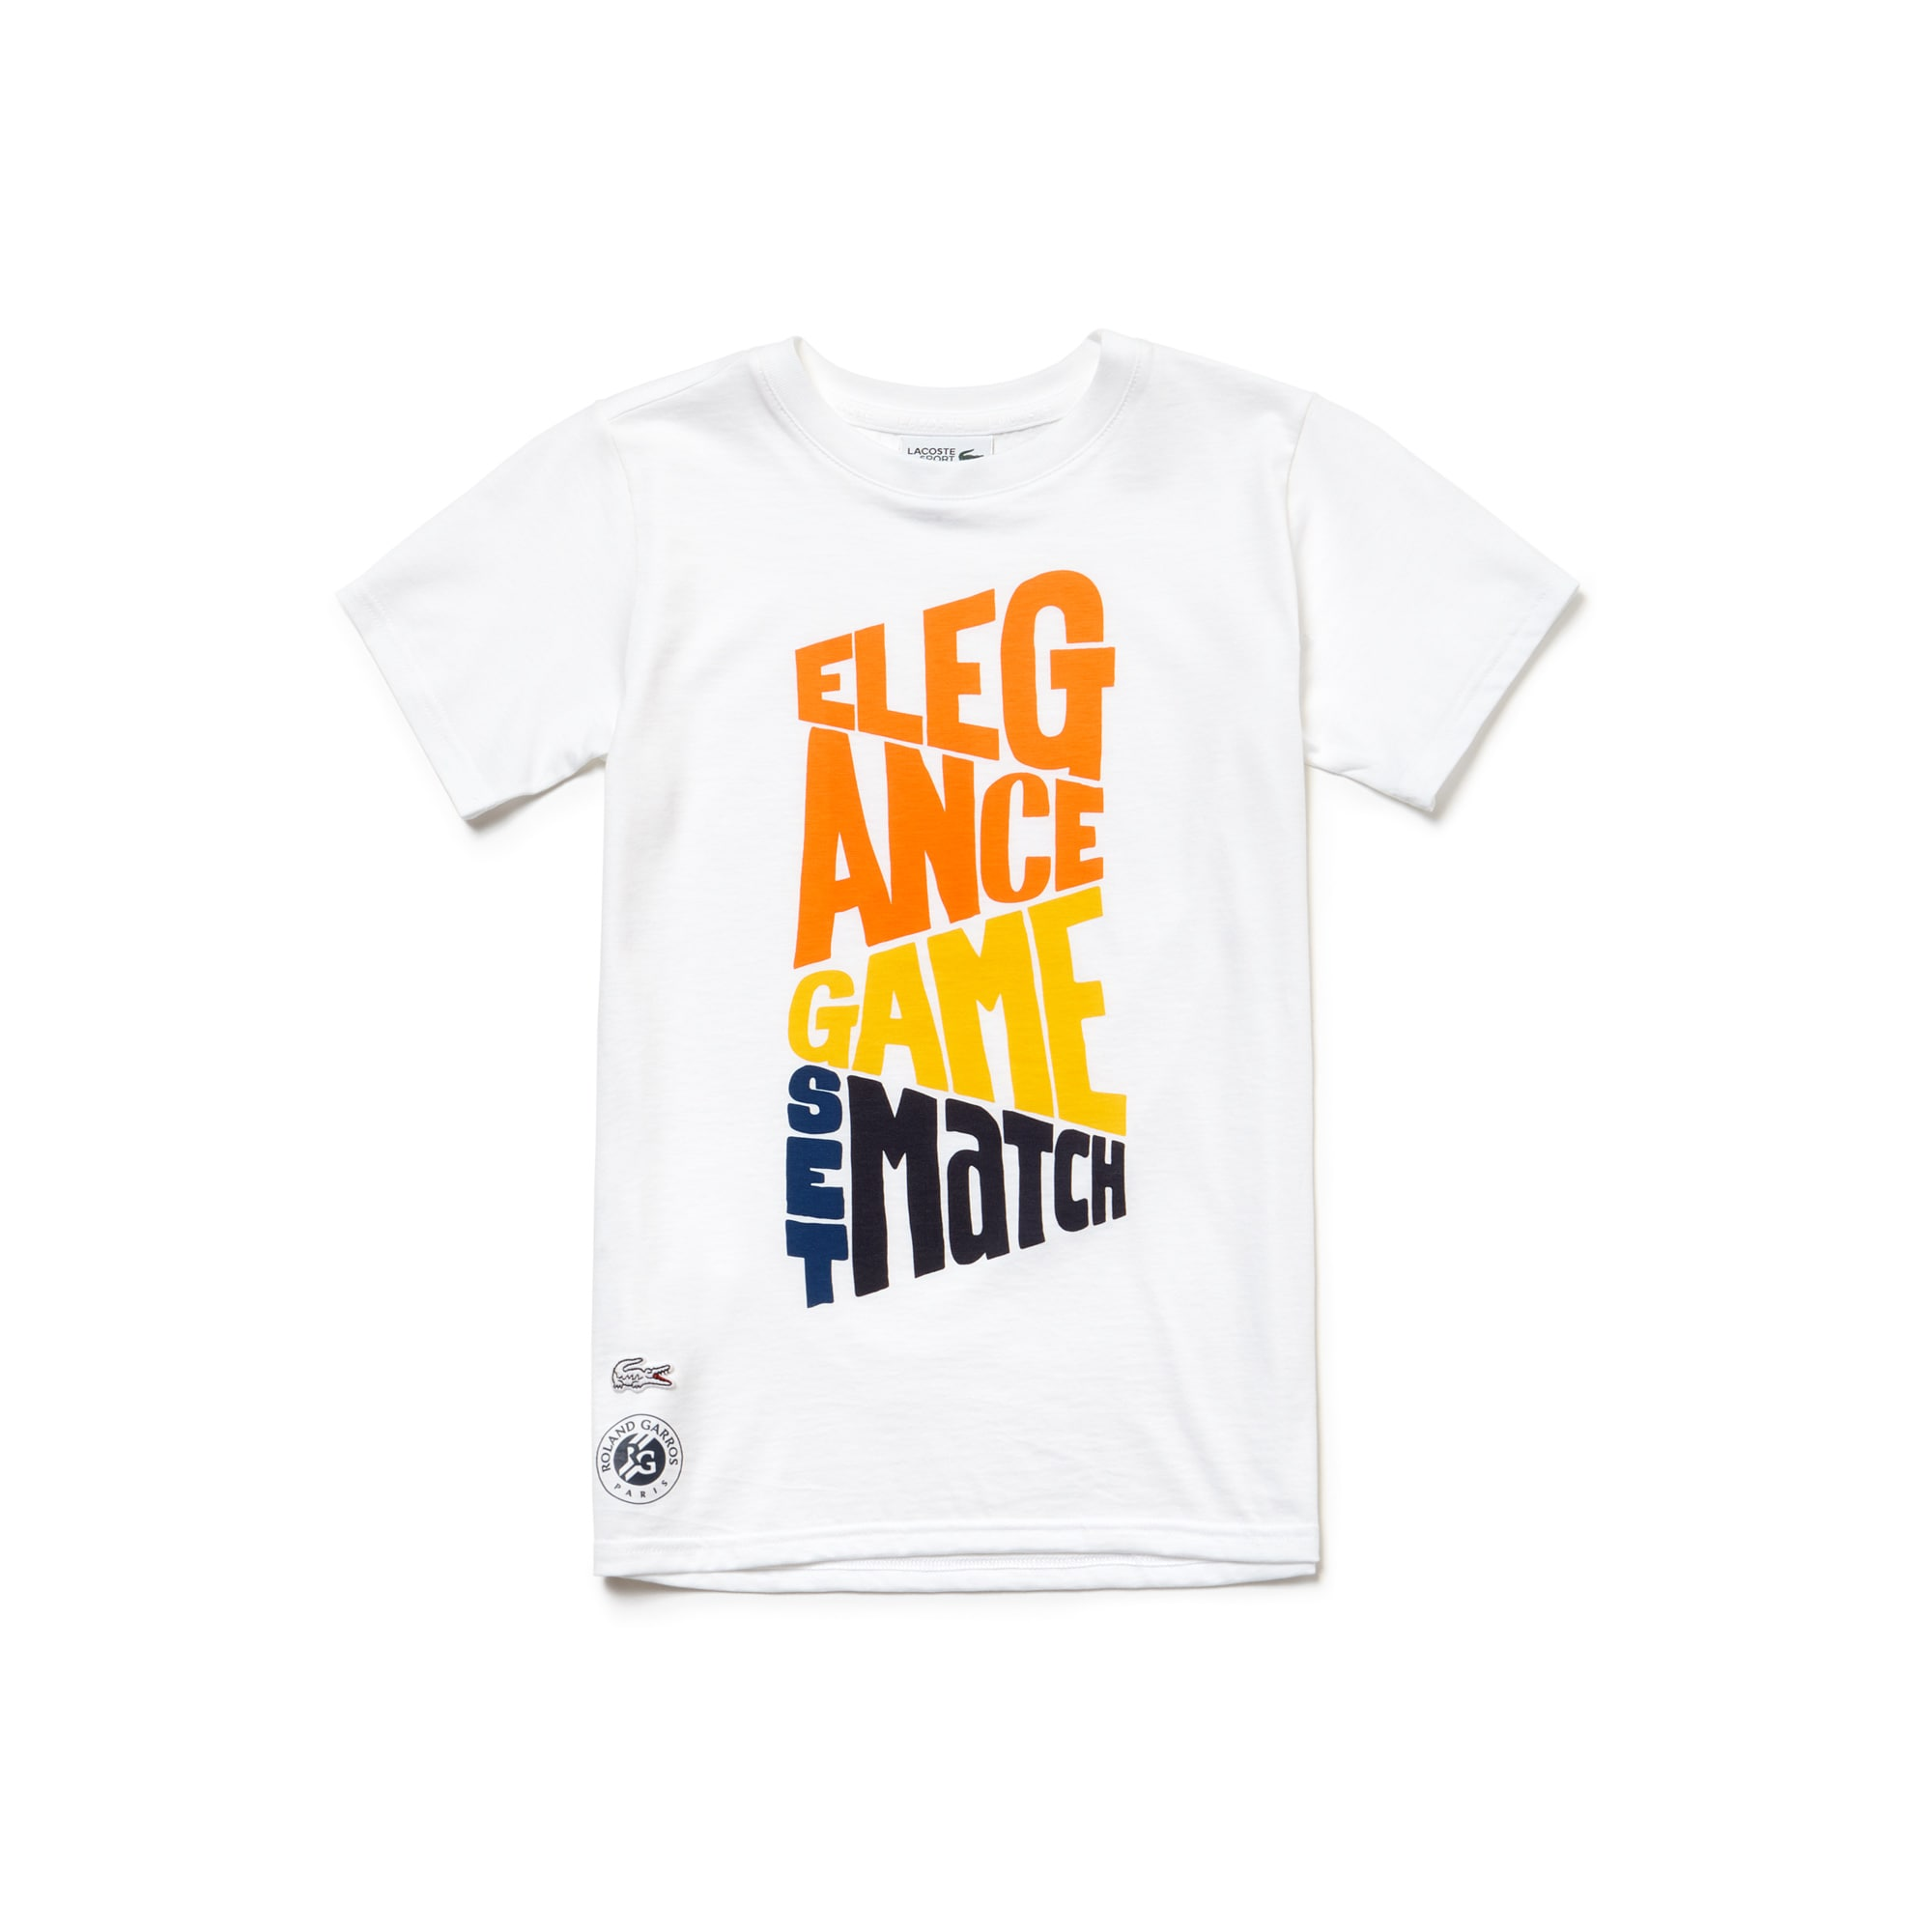 Jungen LACOSTE SPORT Roland Garros Edition Baumwoll-T-Shirt